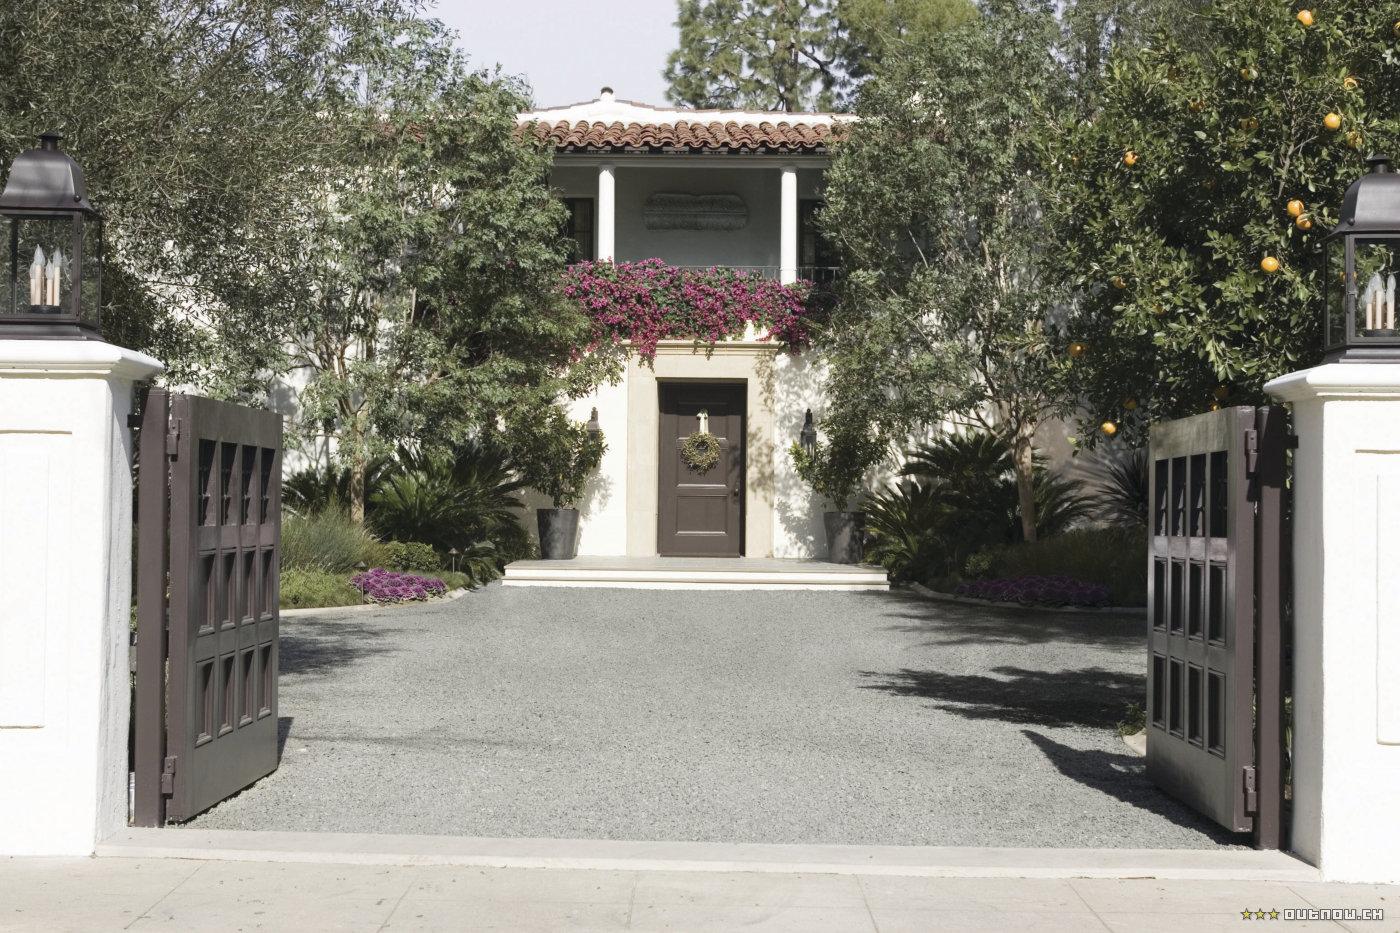 The Holiday LA House Wallace Neff Cameron Diaz Kate Winslet Wisteria